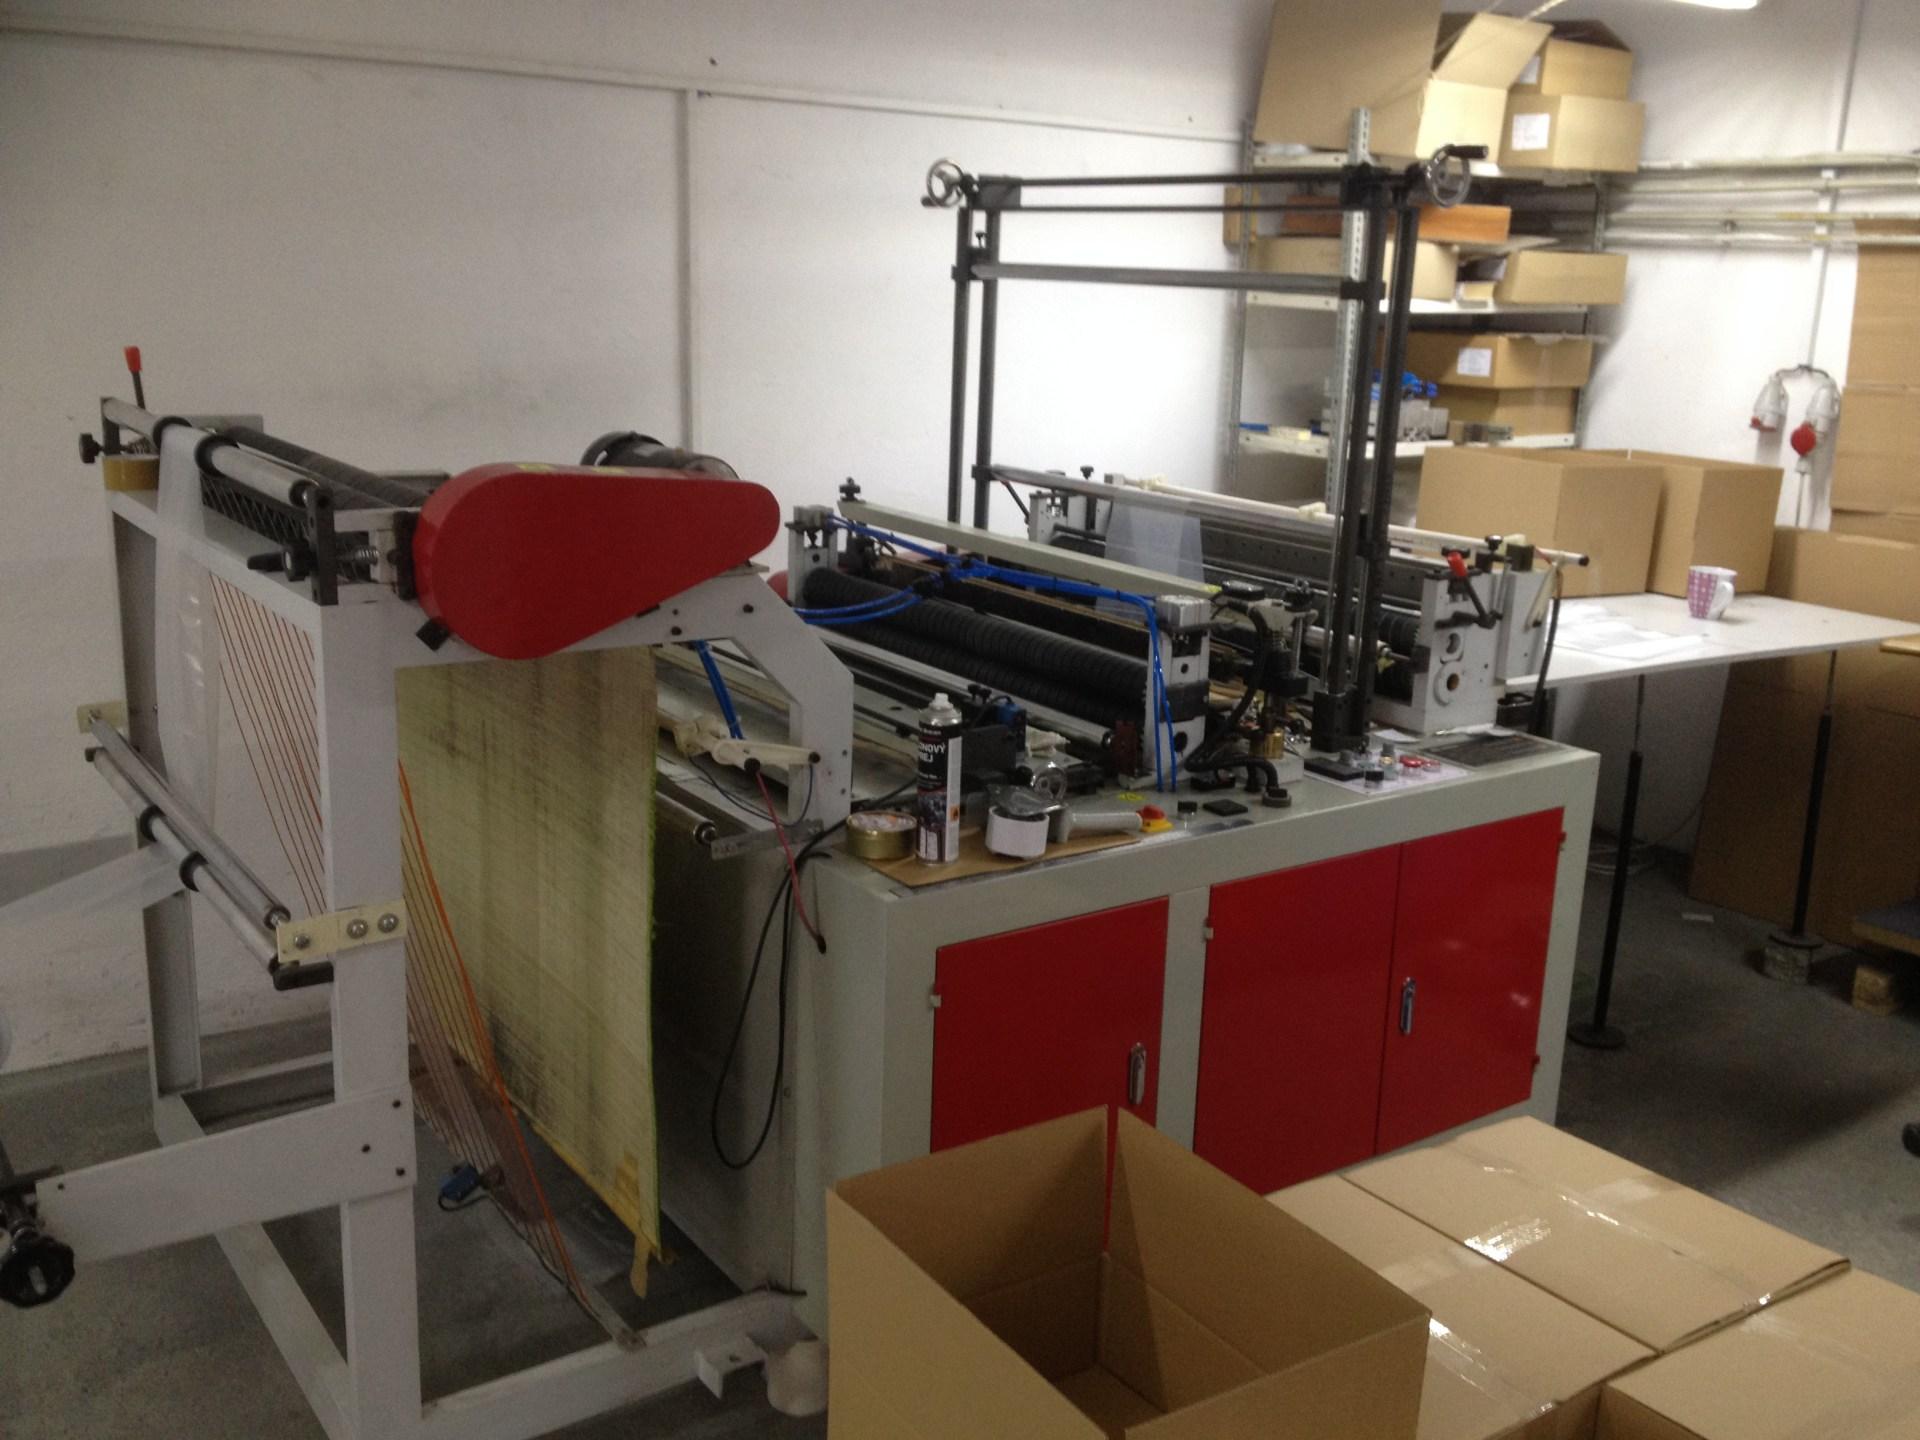 Stroj na výrobu obalů